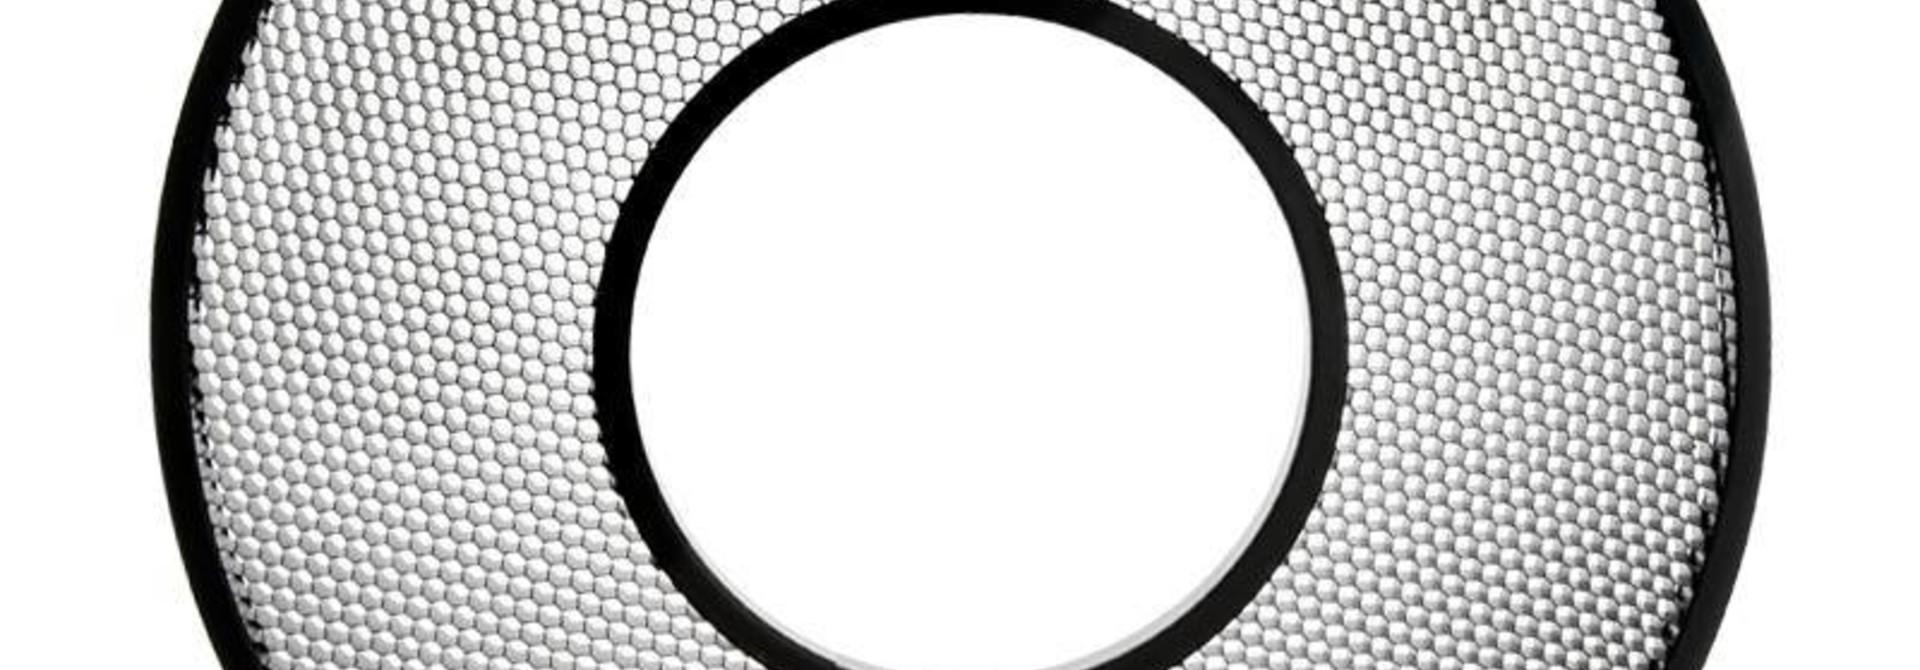 20° Grid AlienBees Ringflash Reflector